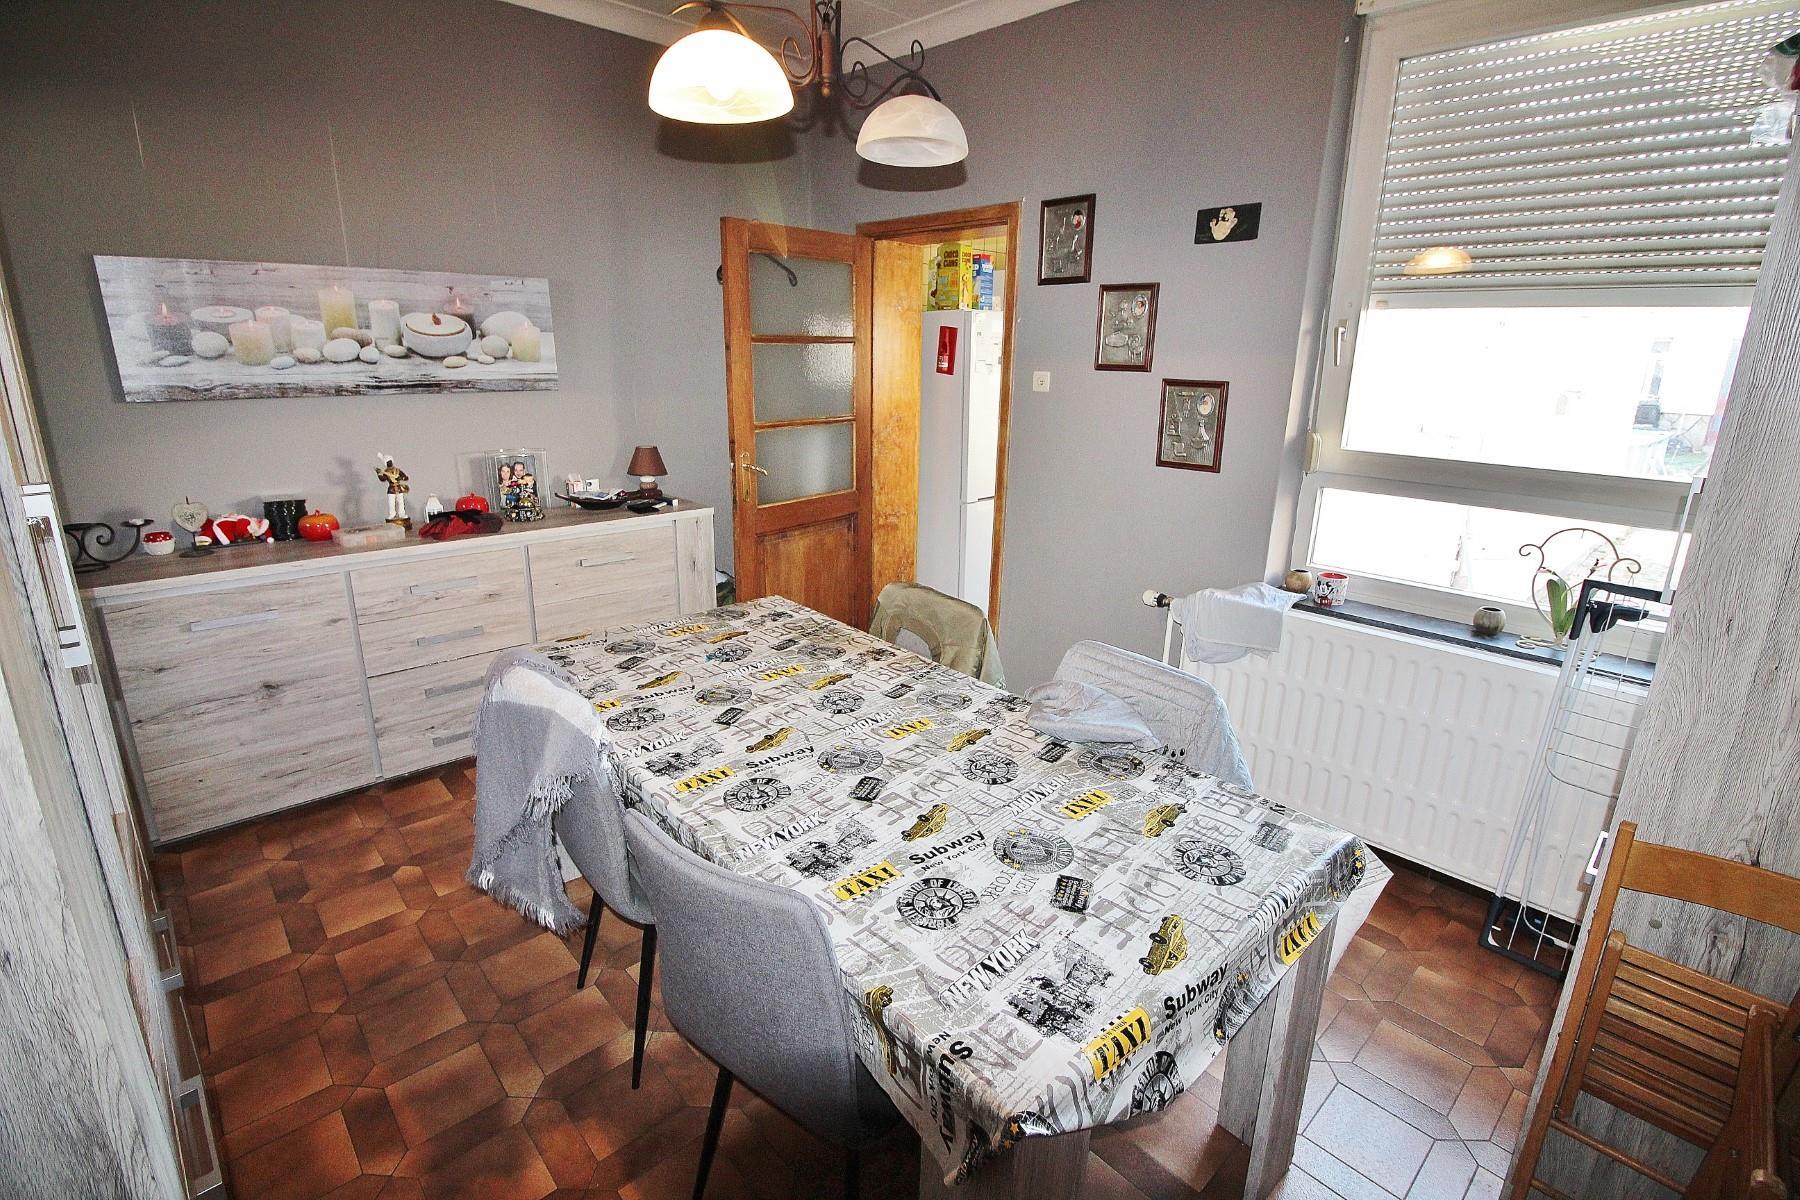 Maison - Beyne-Heusay - #3688311-4